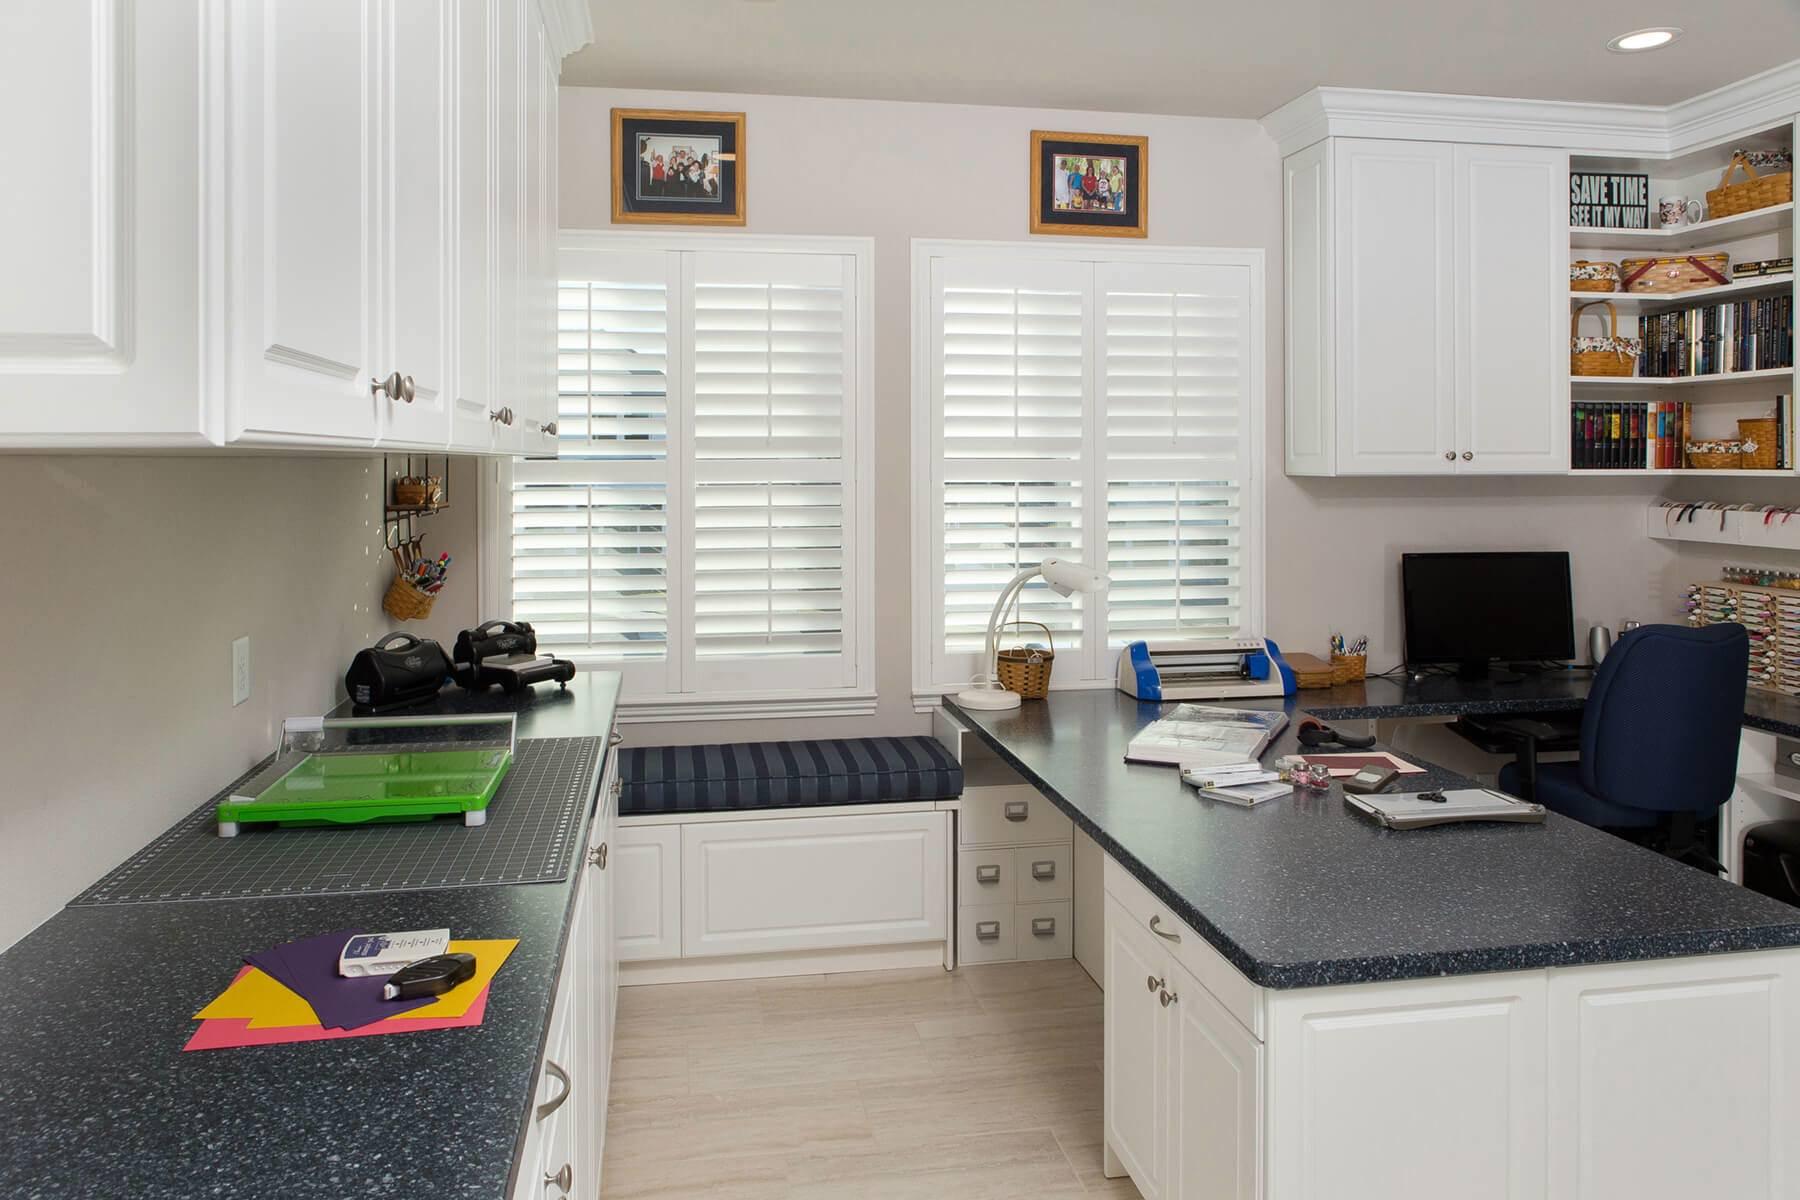 Best Kitchen Gallery: 23 Craft Room Design Ideas Creative Rooms of Home Office Room Designs  on rachelxblog.com